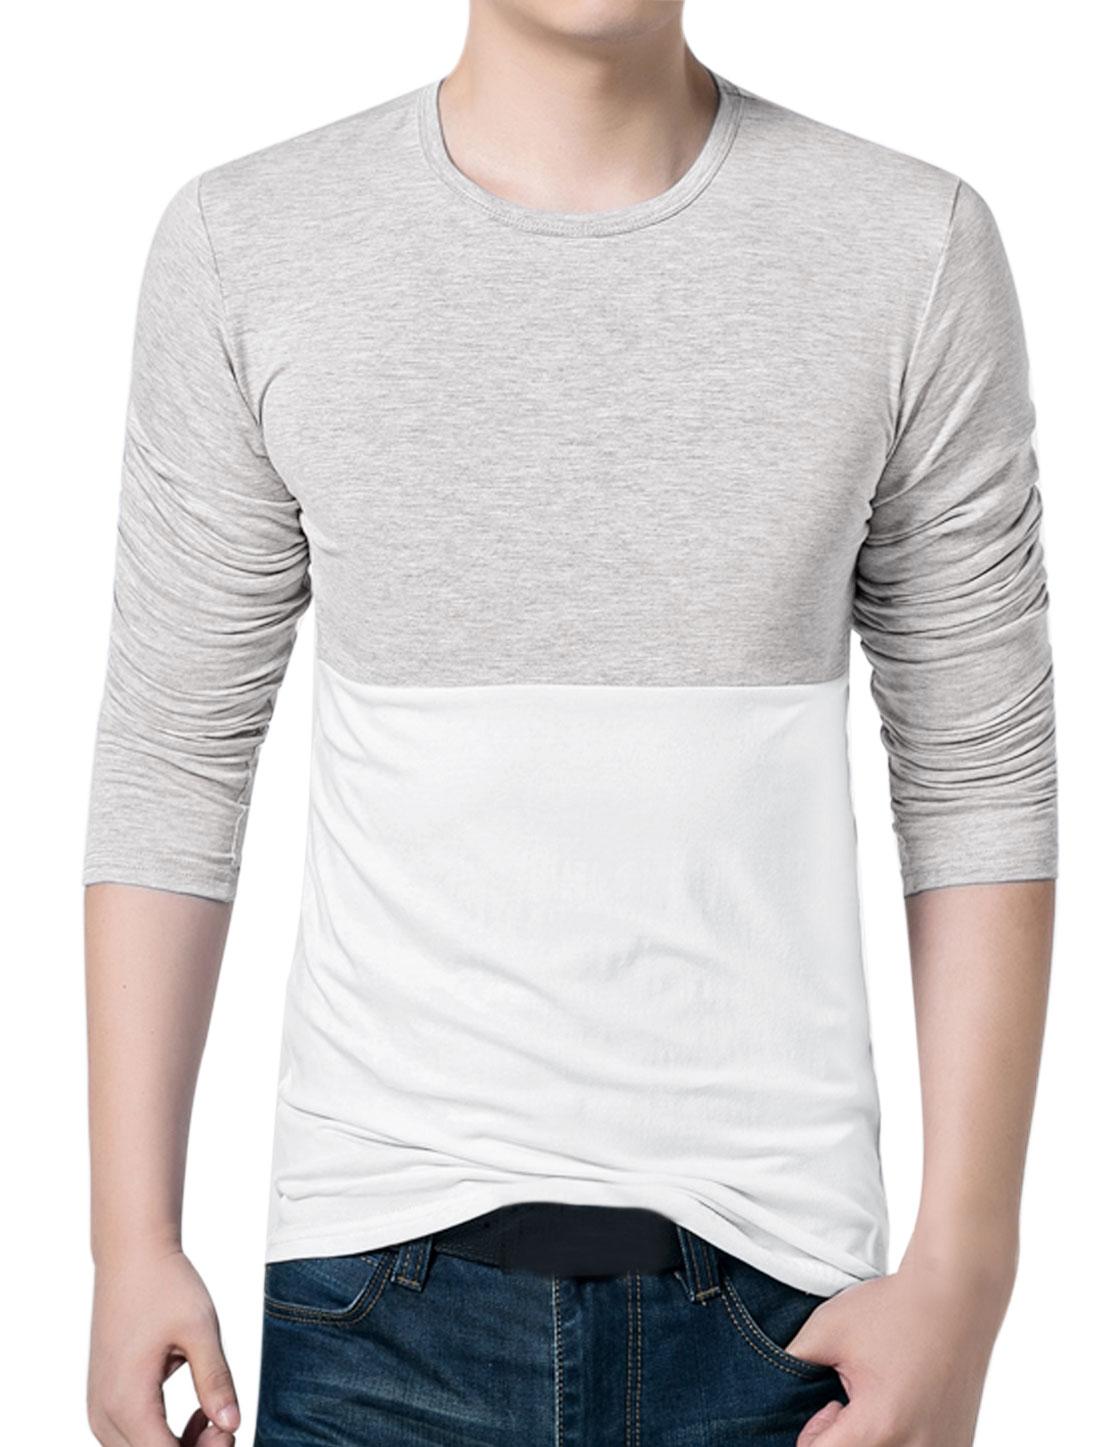 Men Crew Neck Long Sleeves Color Block Slim Fit T-Shirt Gray White S